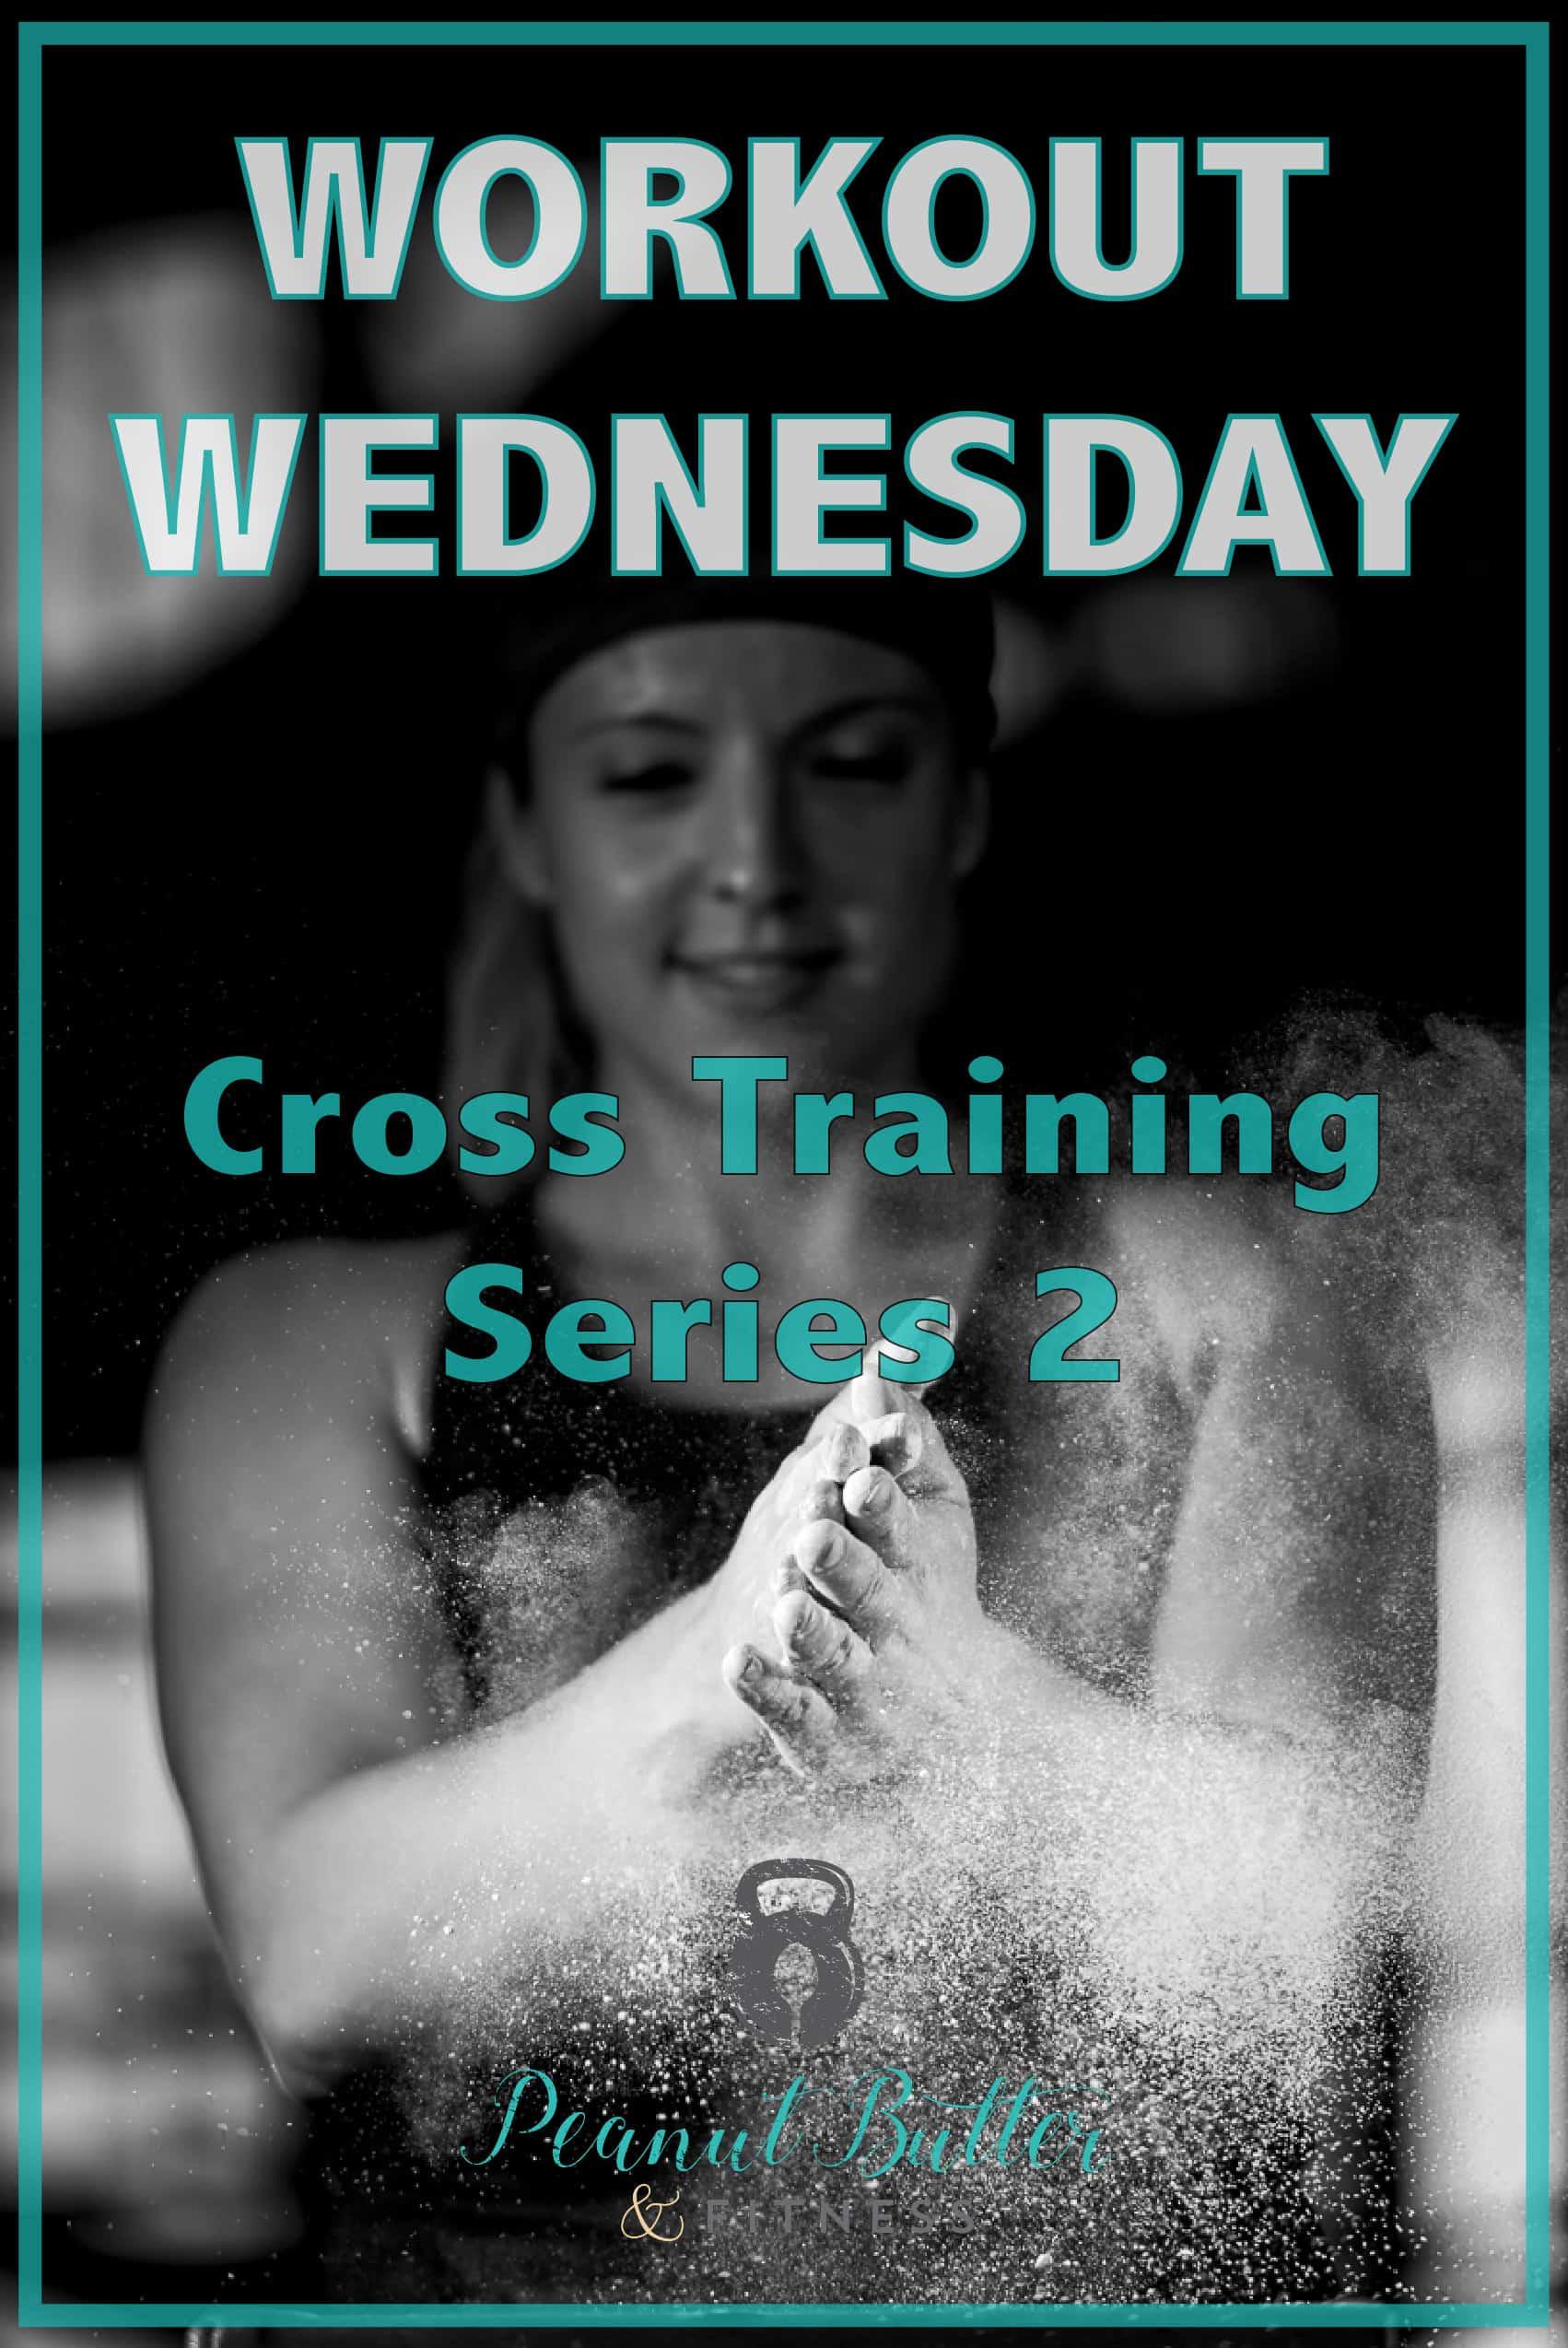 workout wednesday - cross training series 2-01